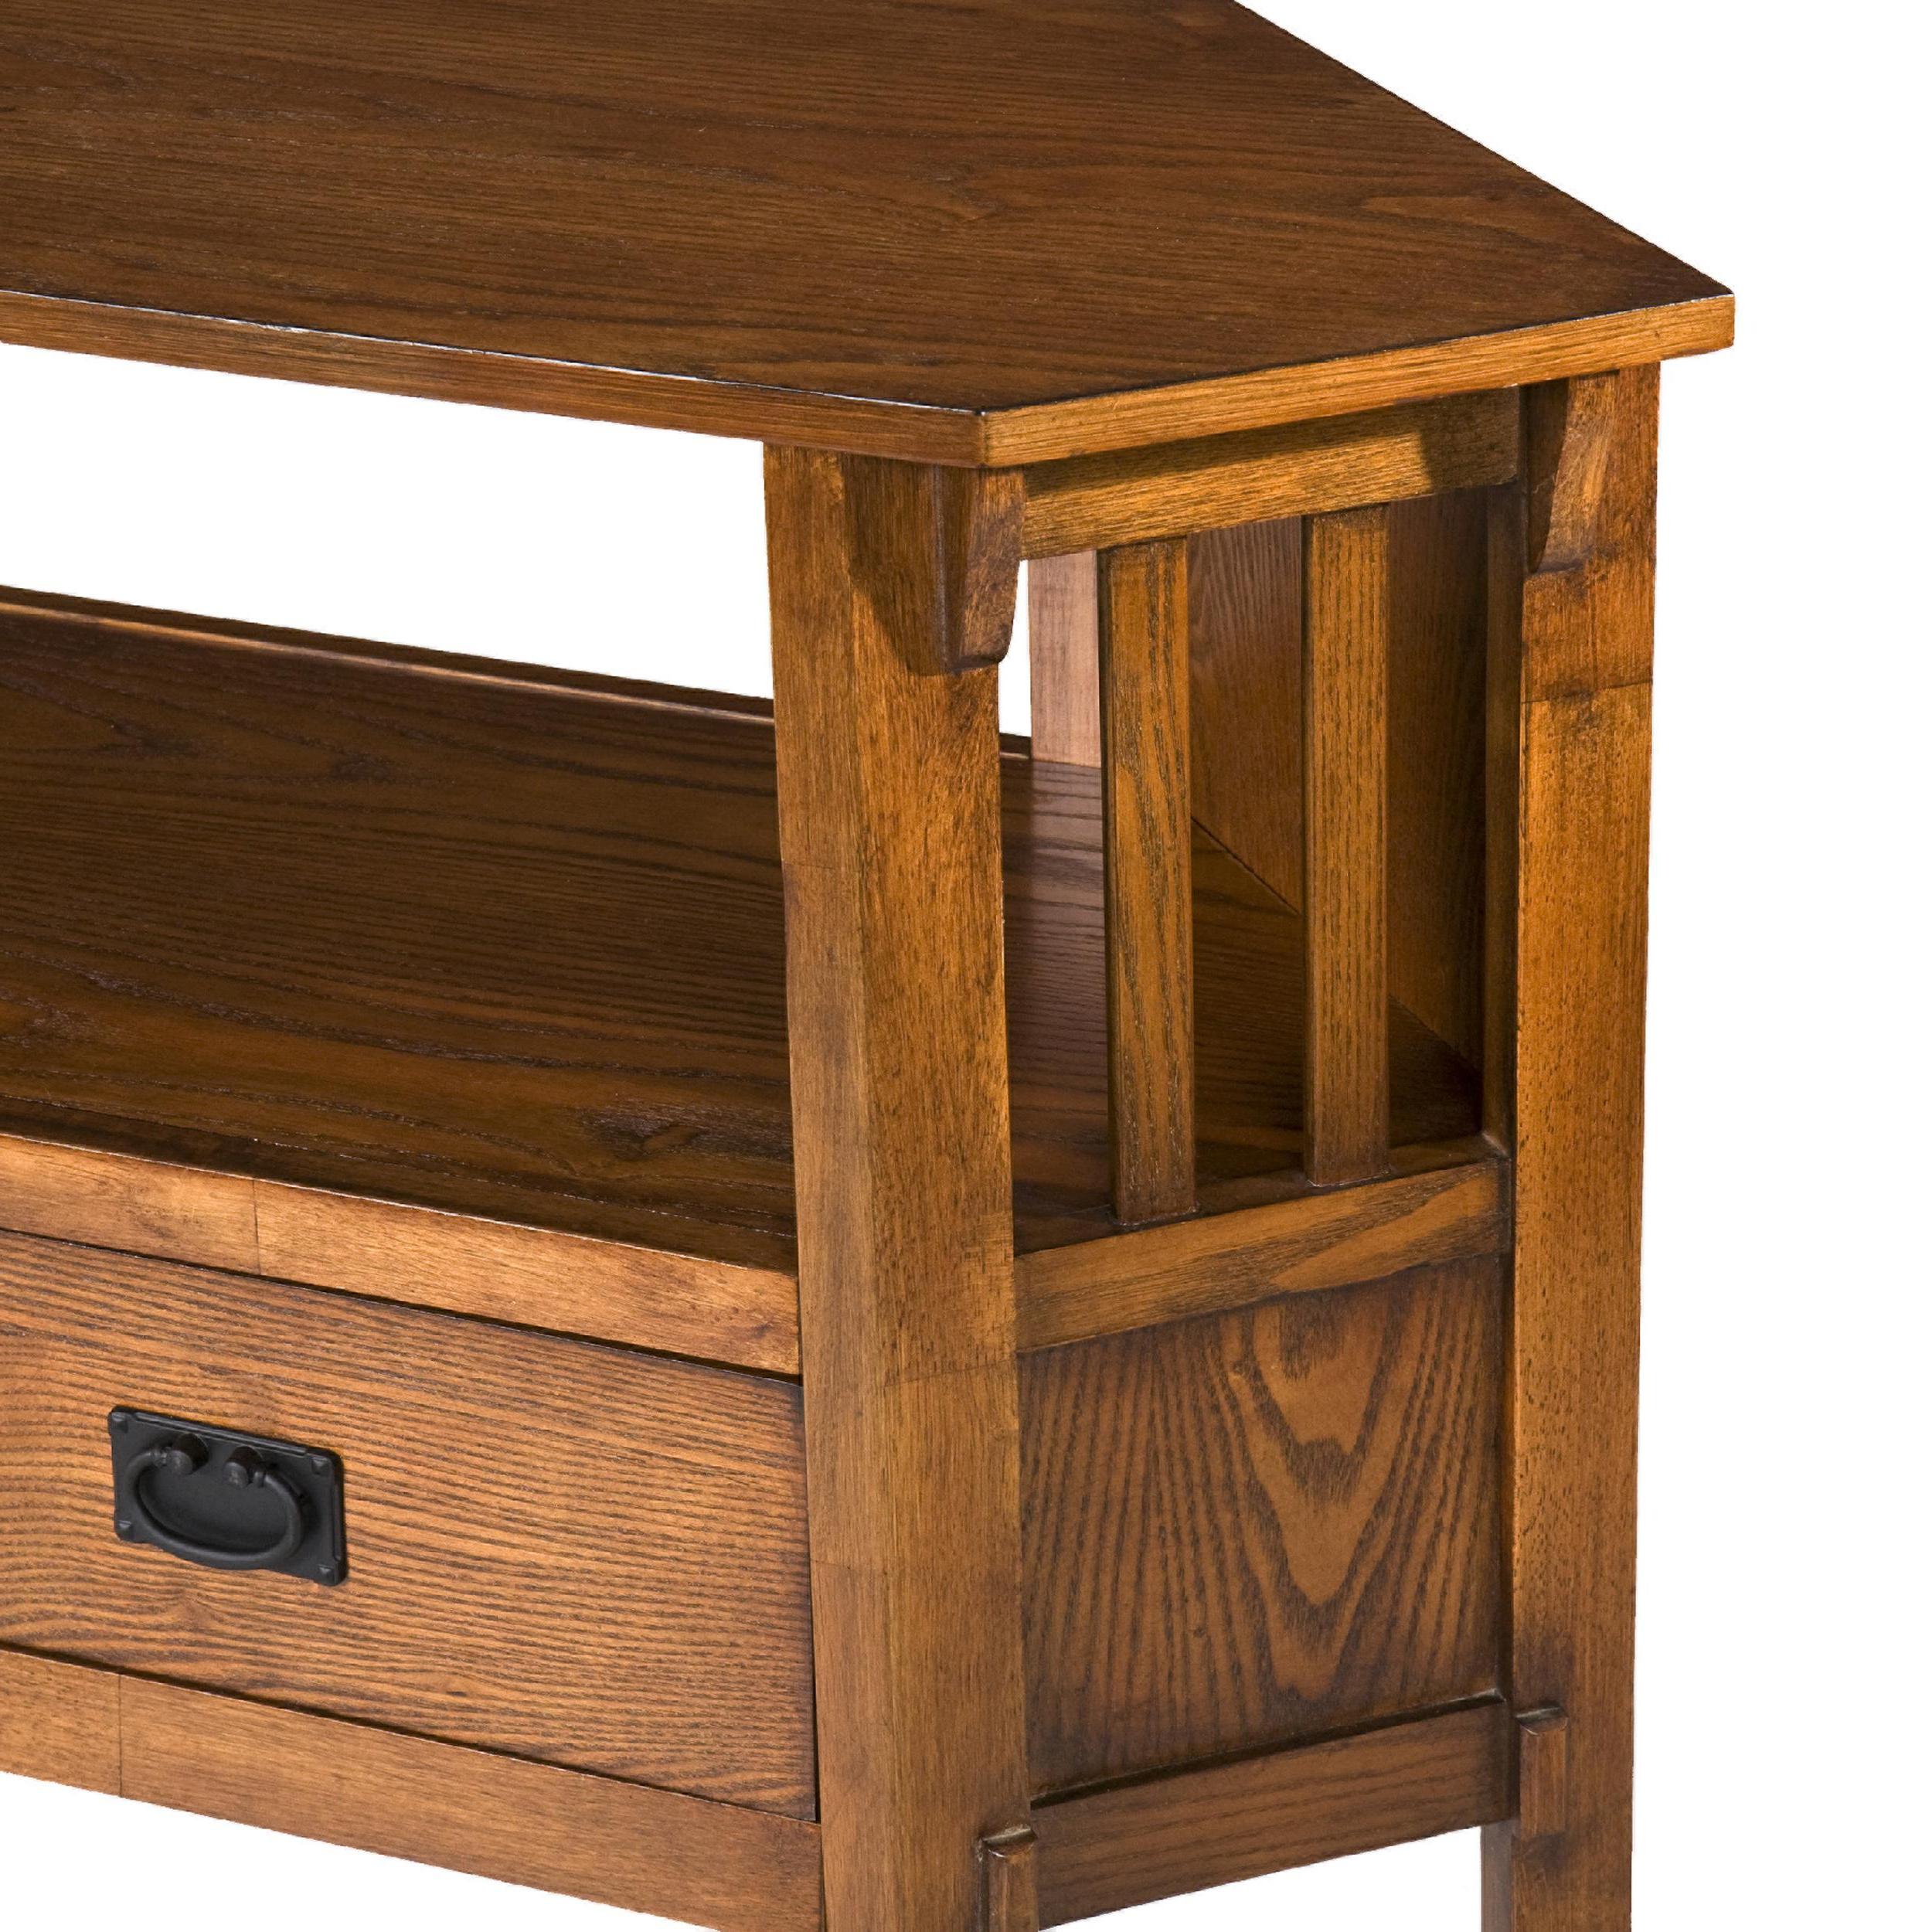 Fashionable Samira Corner Tv Unit Stands Regarding Amazon – Sei Carson Oak Corner Media Stand – Oak (View 7 of 10)